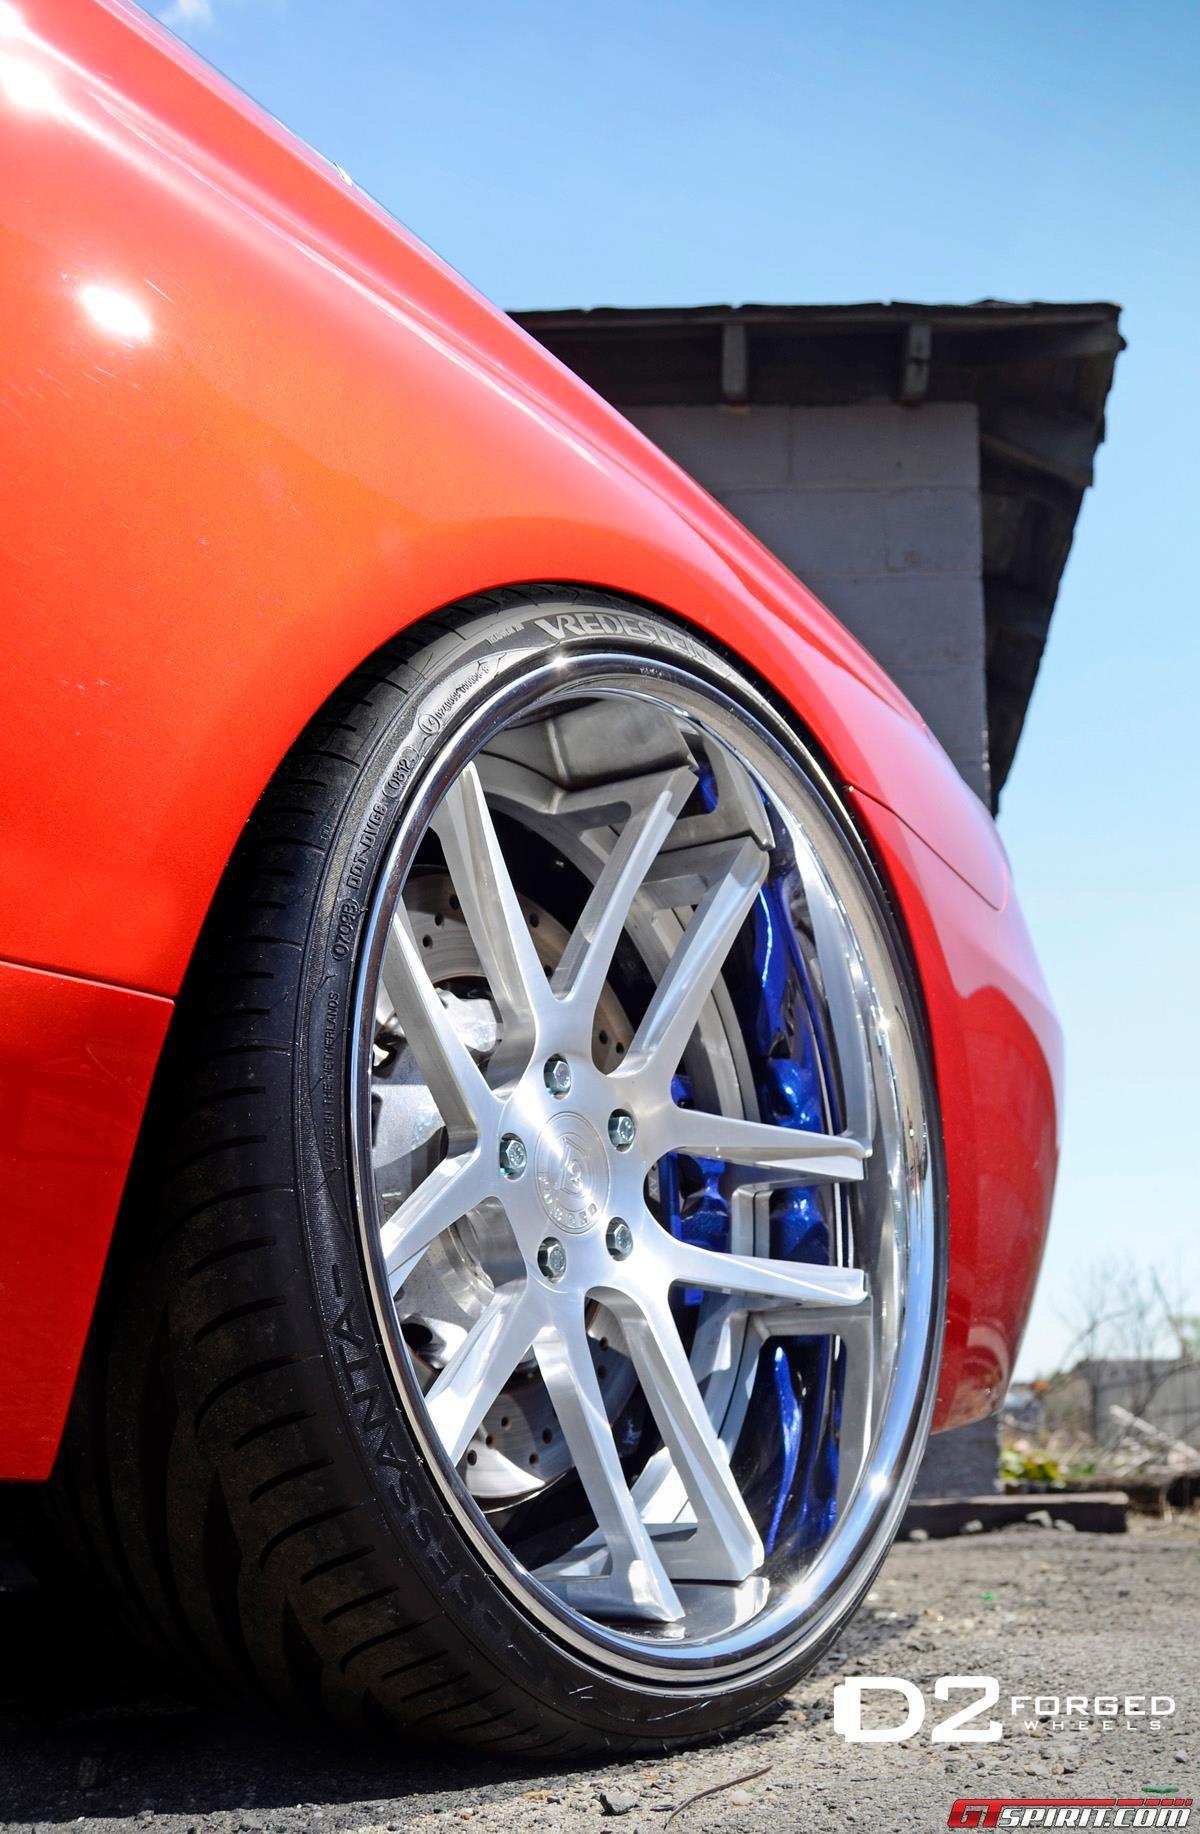 bmw-m-dforged-vs-wheels-Hd-Bmw-M-Coupe-Bmw-M-Coupe-Wallp-wallpaper-wp3603602